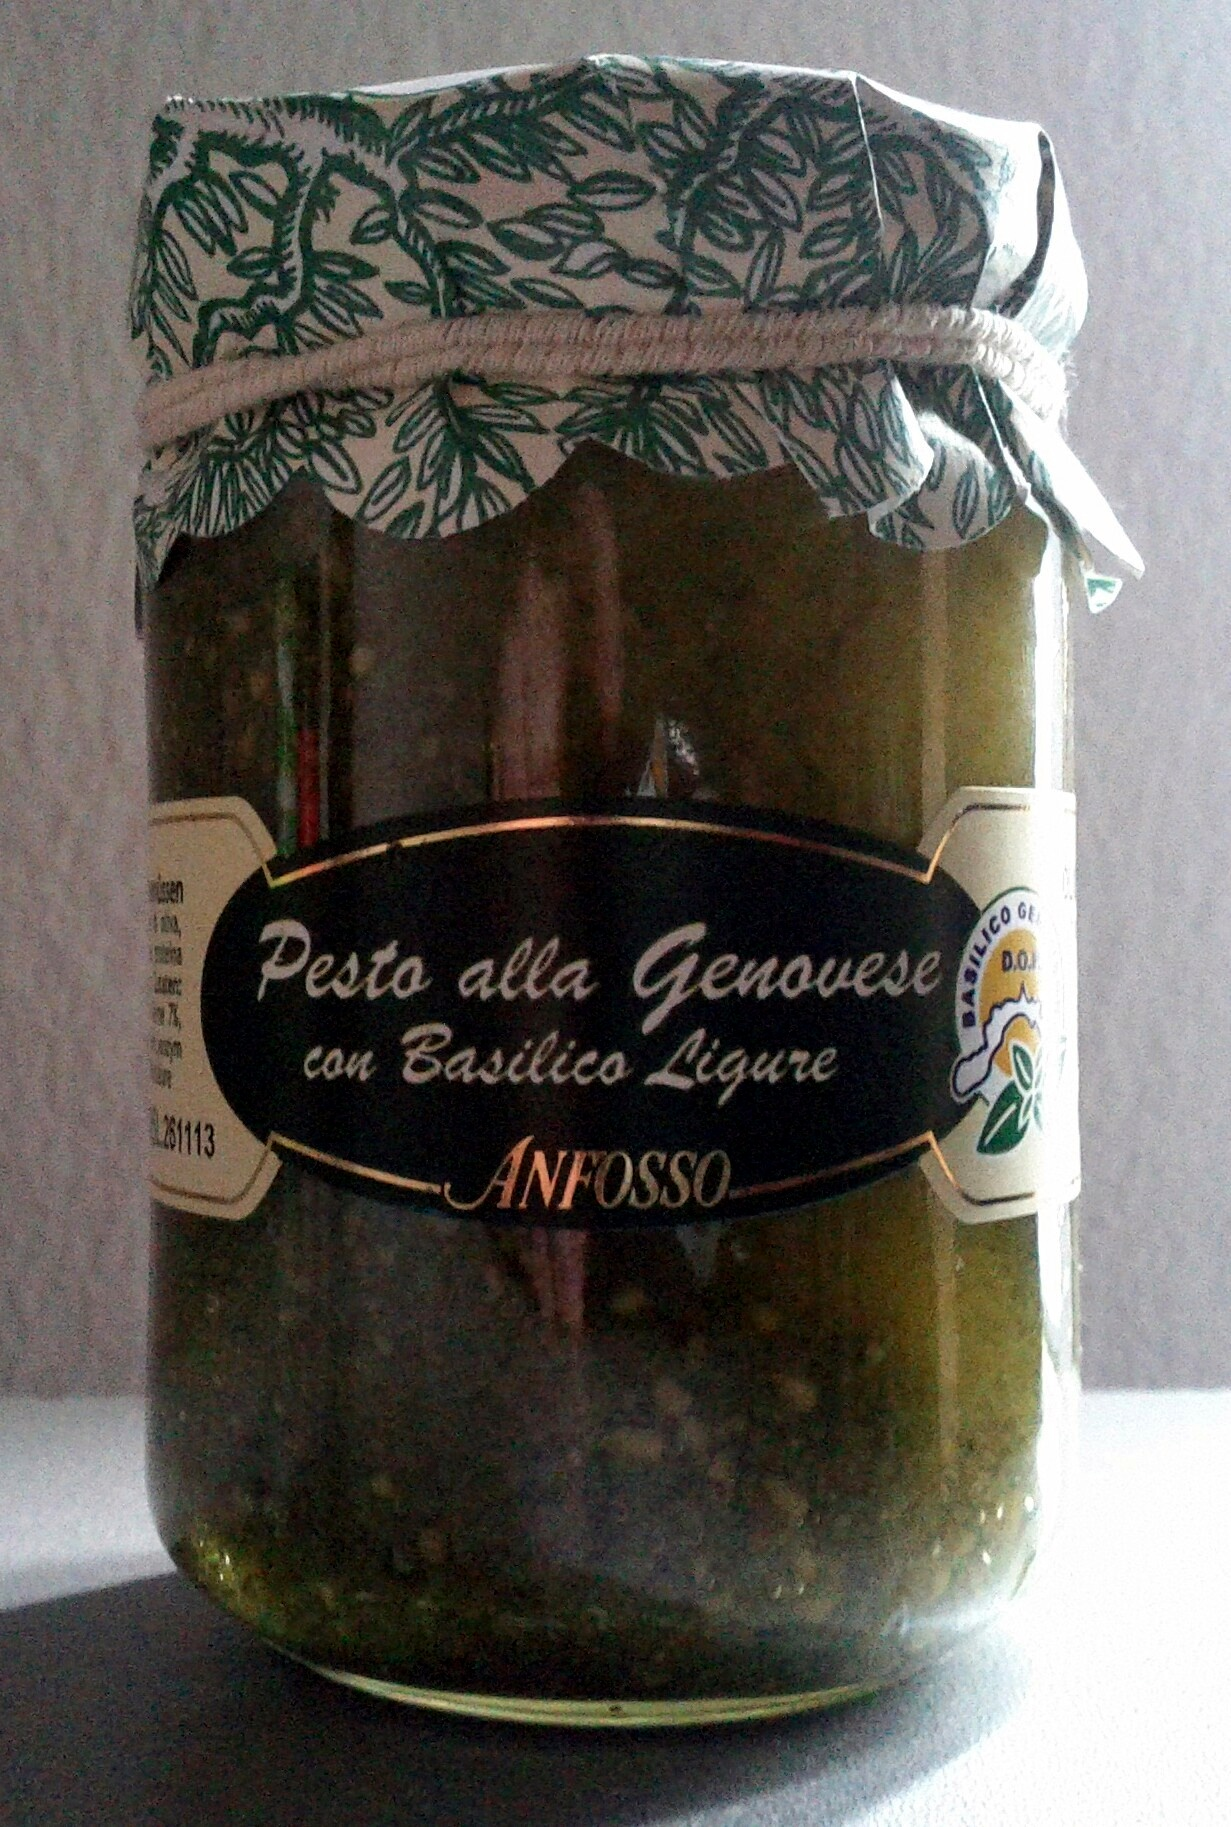 Anfosso Pesto alla Genovese con Basilico Ligure - Produit - de